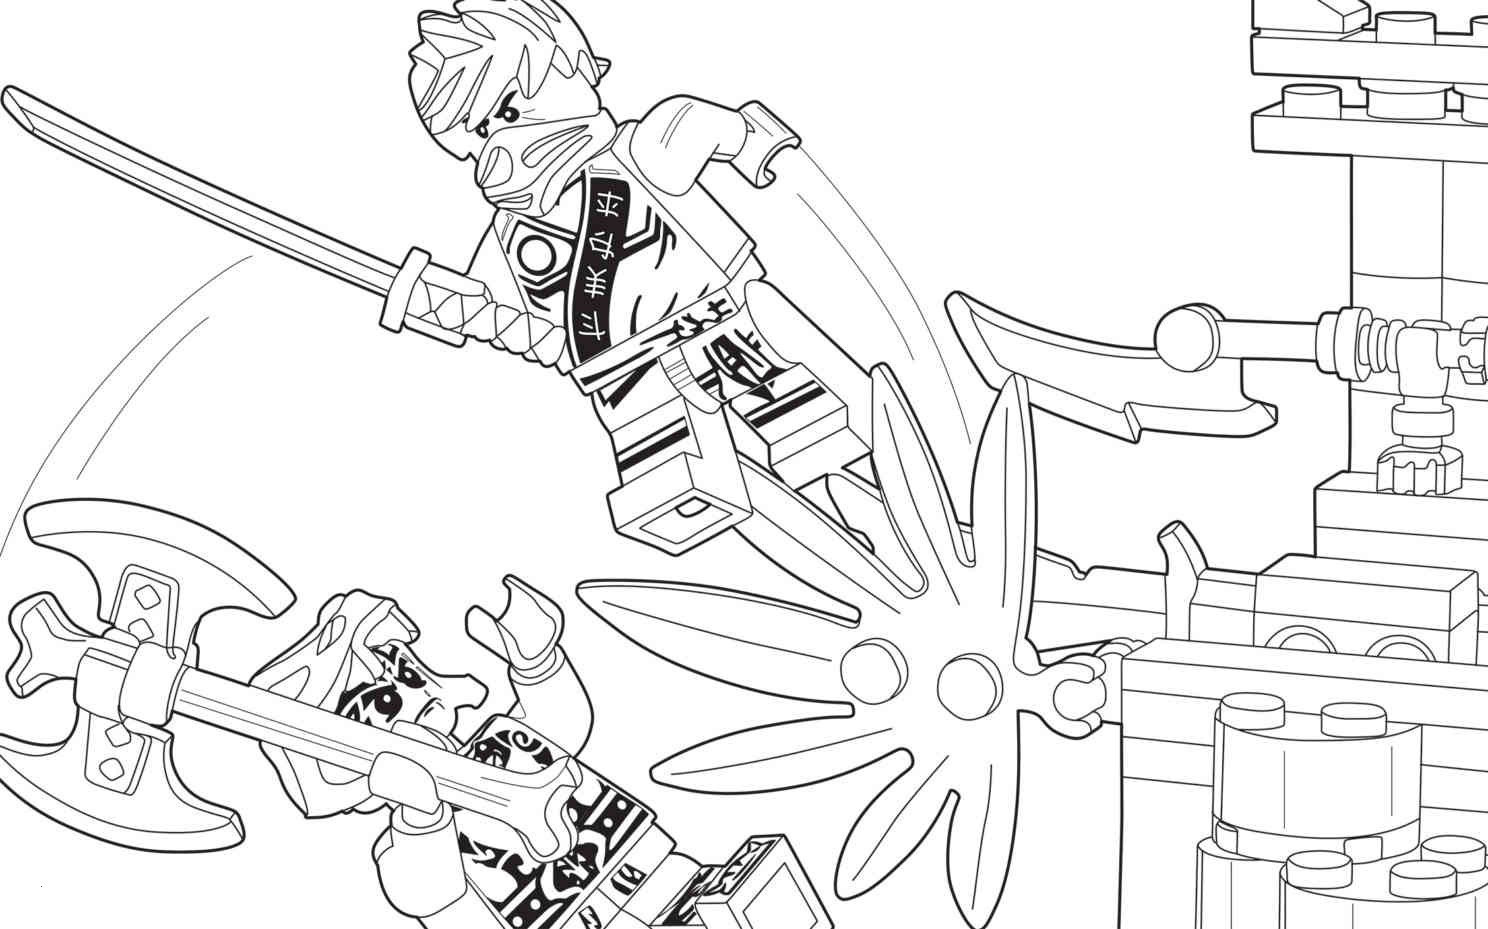 Ninjago Augen Malvorlage Frisch Ninjago Malvorlagen Zum Ausdrucken Schön 37 Lego Ninjago Lloyd Galerie